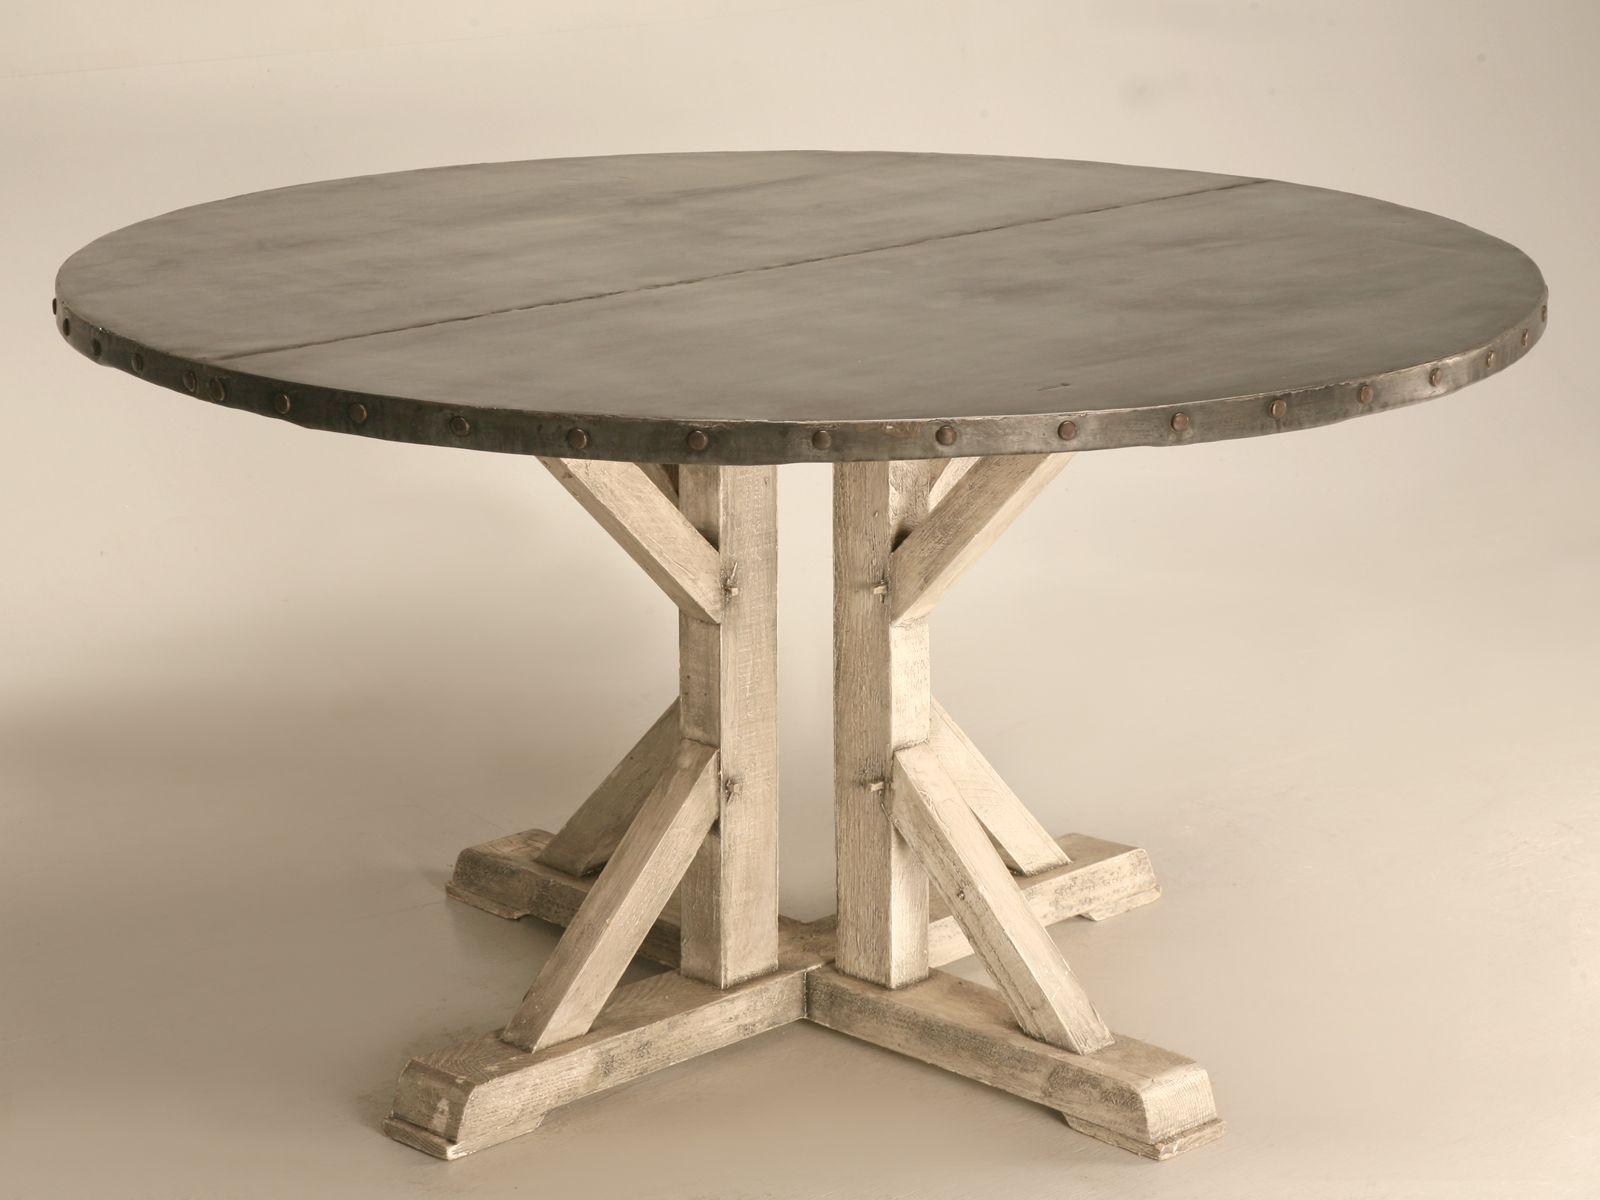 Round Zinc Kitchen Table | Zinc Table Tops | Pinterest ...